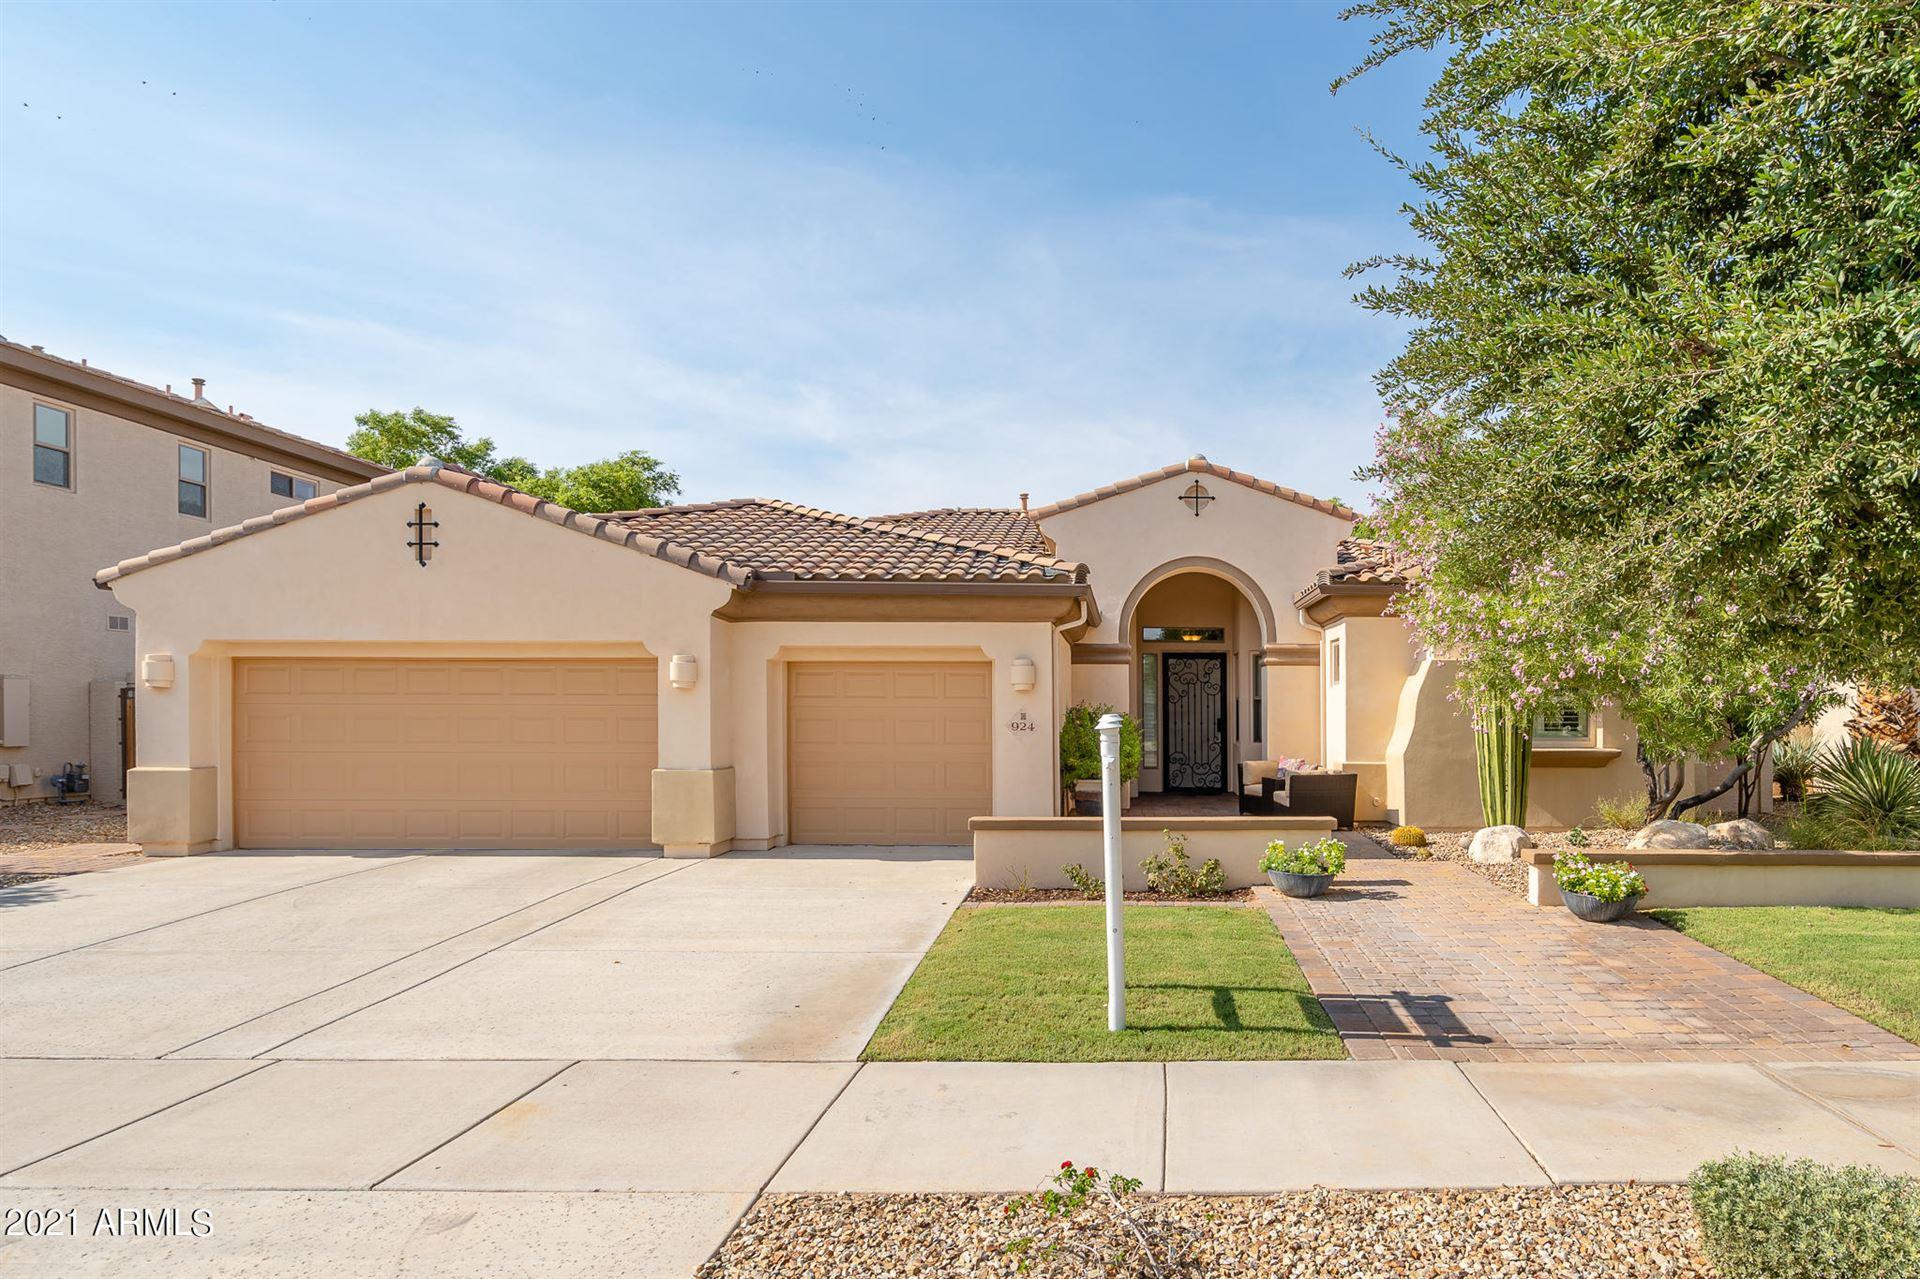 Photo of 924 W GROVE Street, Litchfield Park, AZ 85340 (MLS # 6267623)